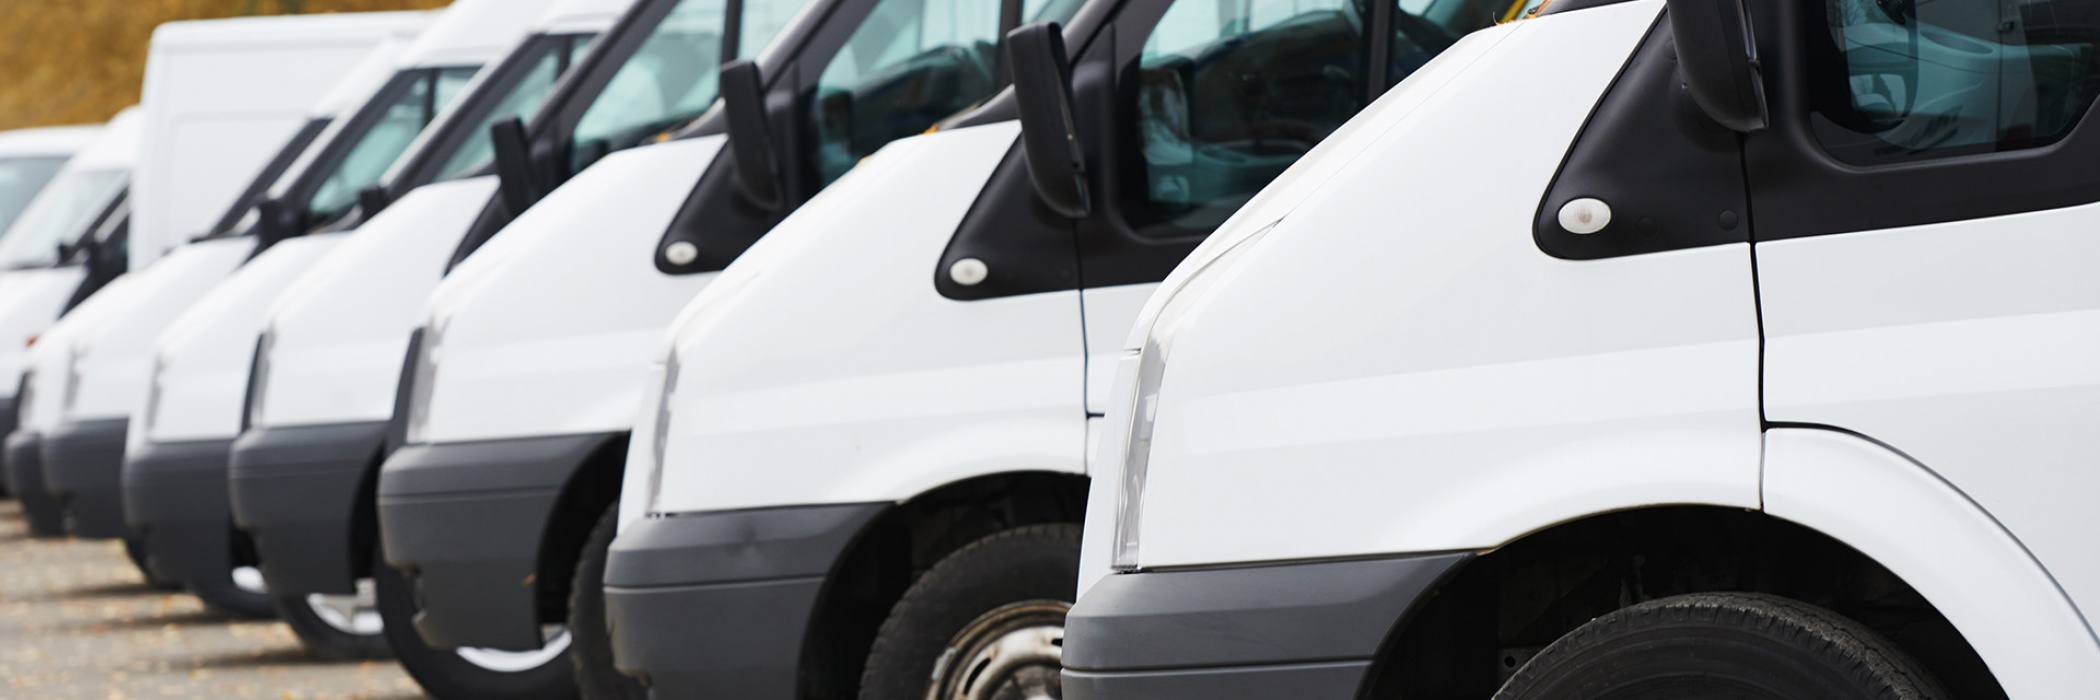 fila di furgoni aziendali